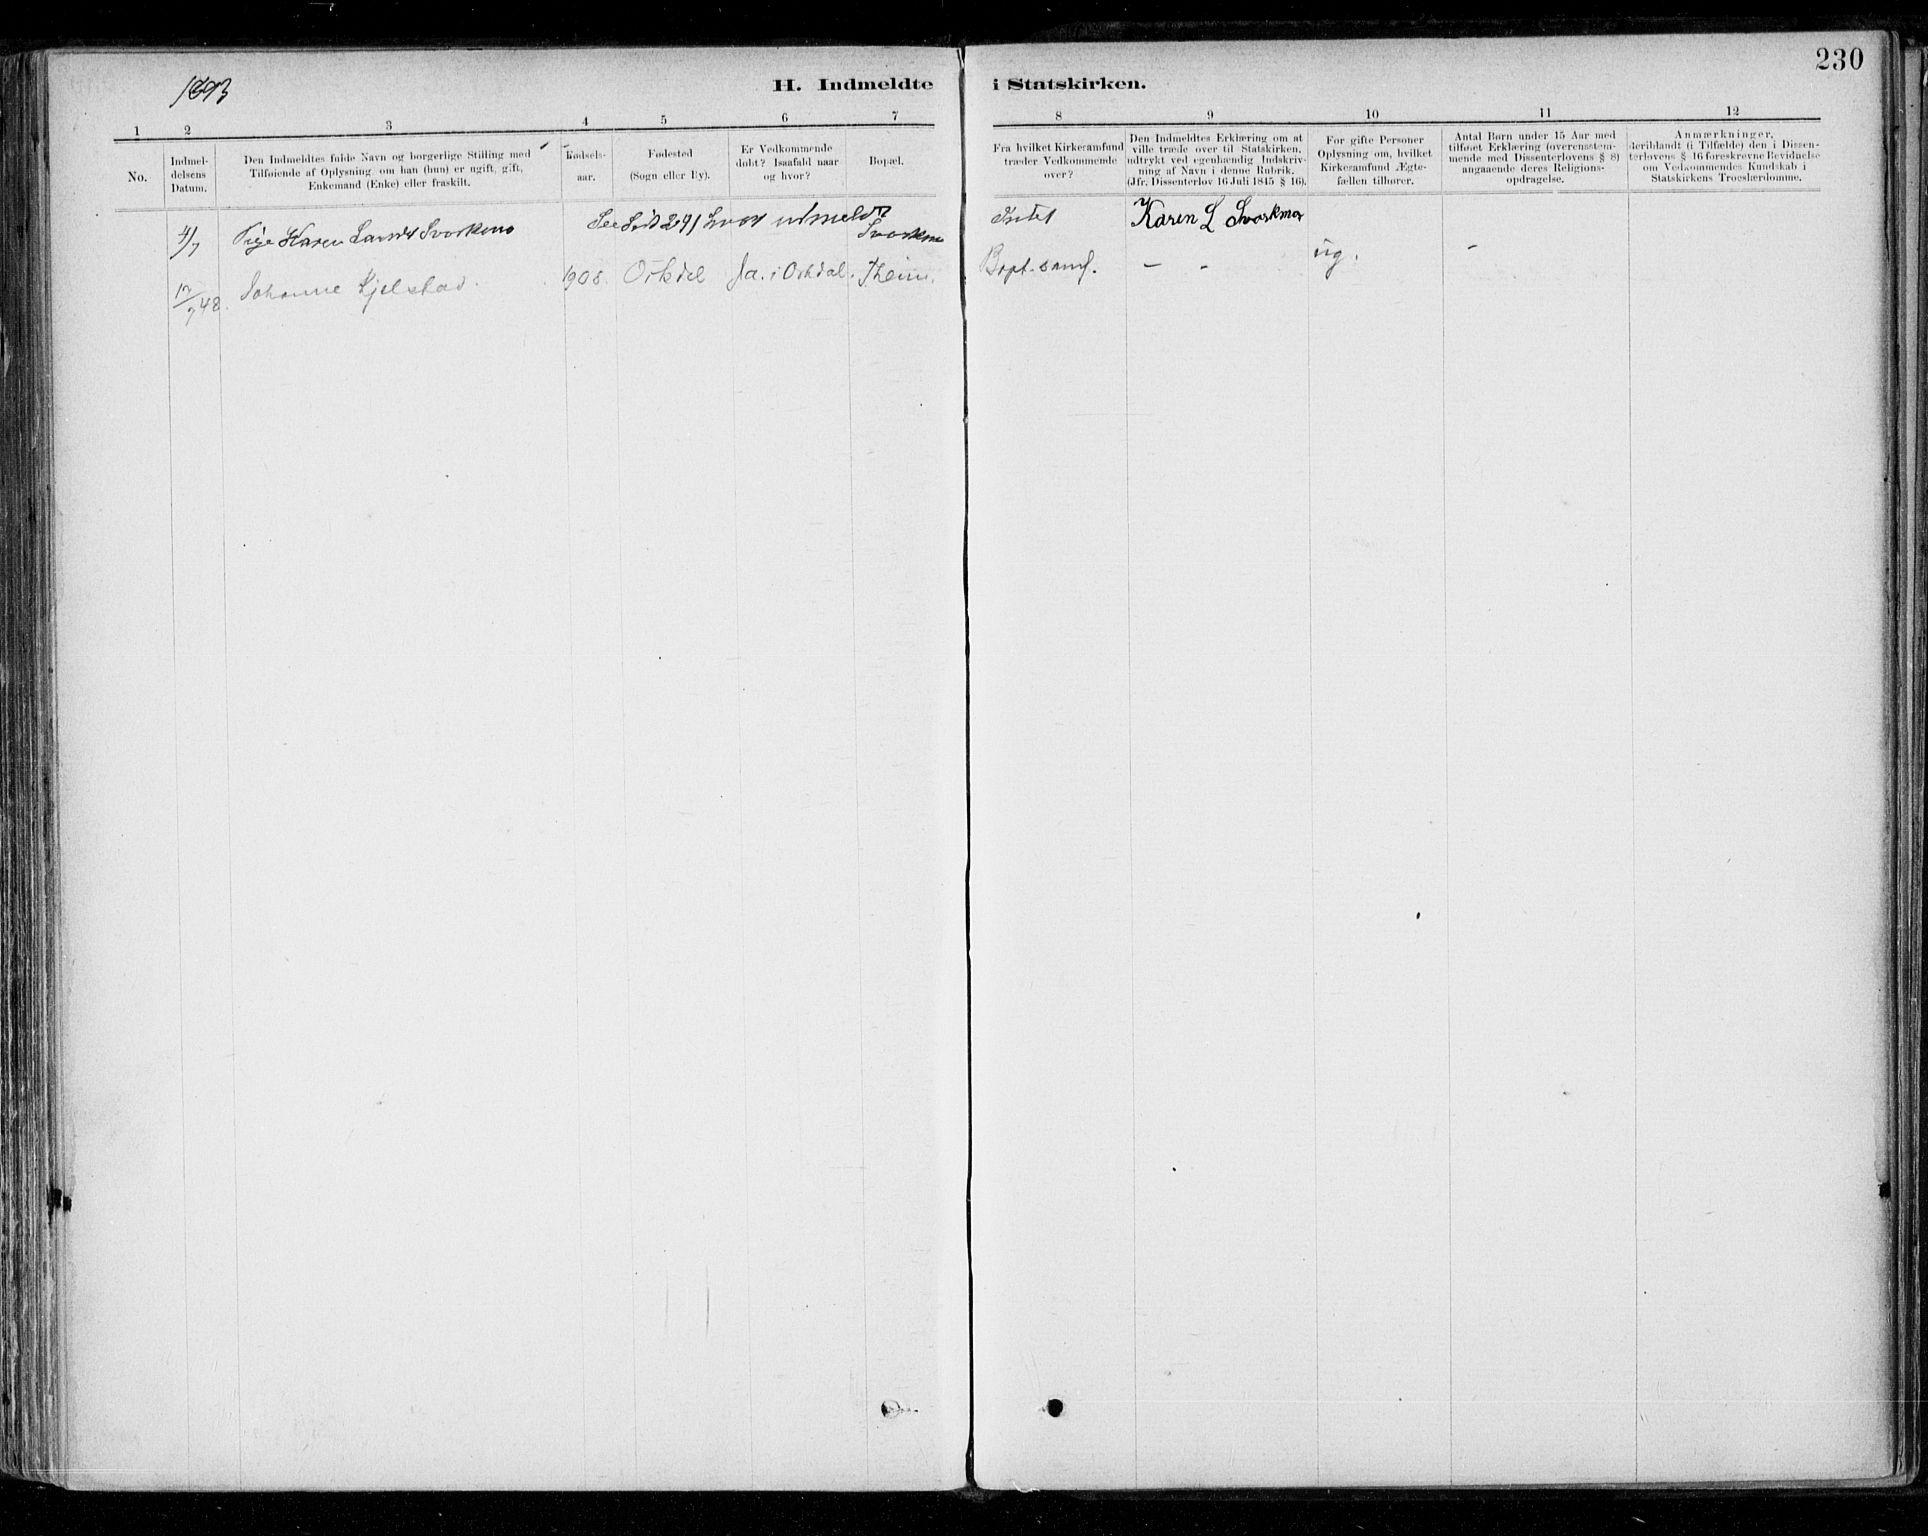 SAT, Ministerialprotokoller, klokkerbøker og fødselsregistre - Sør-Trøndelag, 668/L0810: Parish register (official) no. 668A10, 1881-1894, p. 230